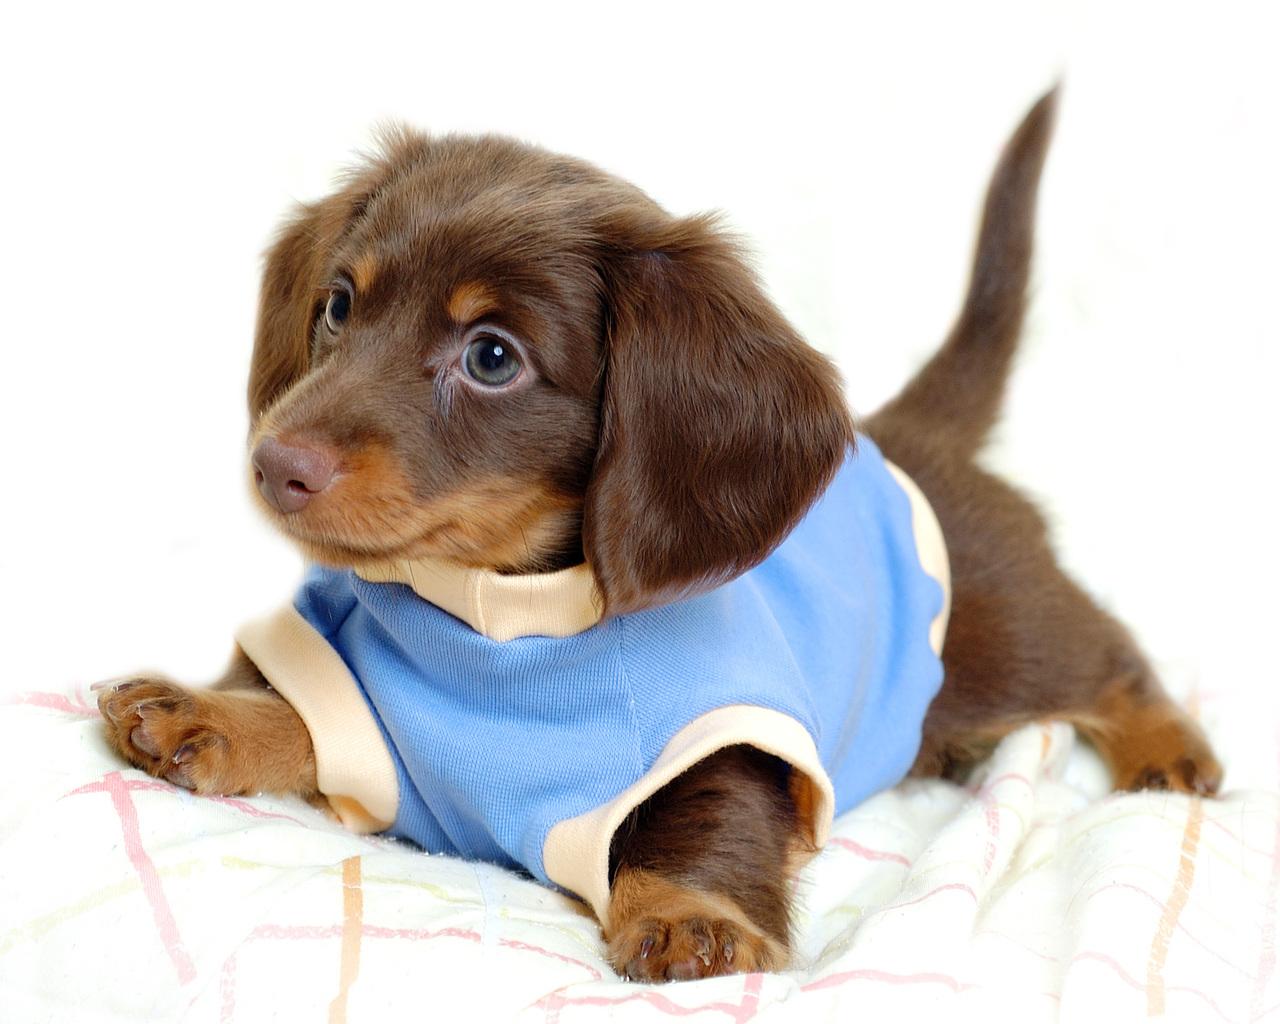 Puppies - Puppies Photo (29017067) - Fanpop